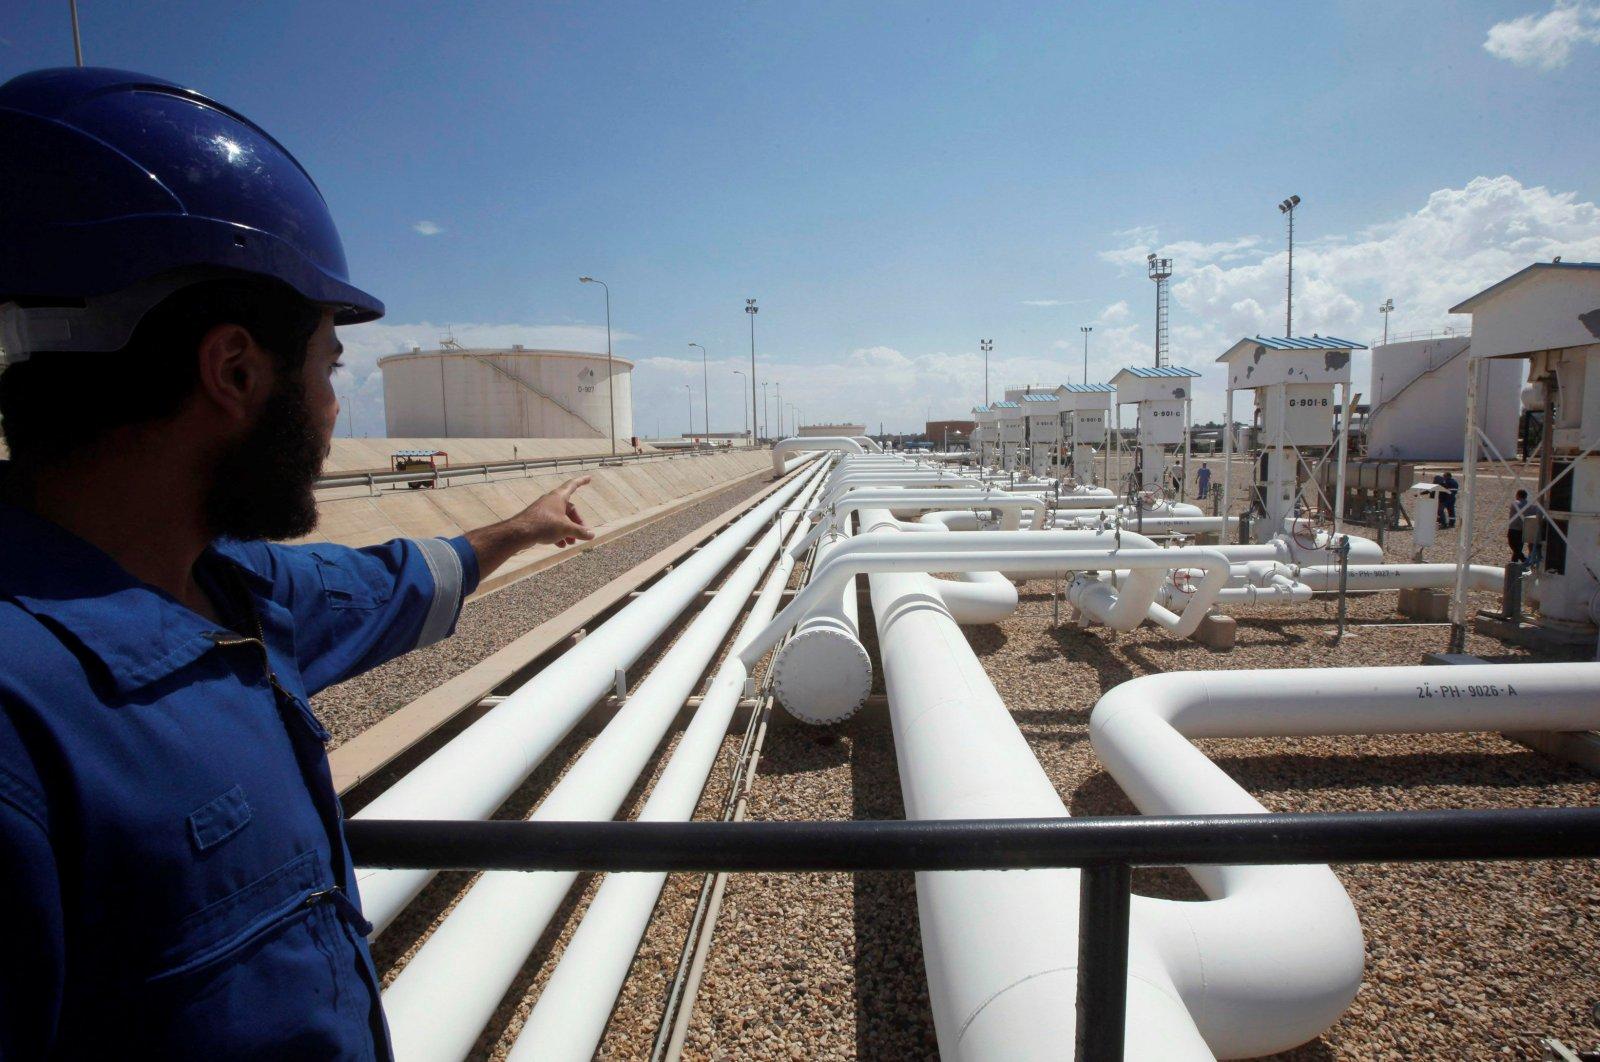 A worker gestures toward pipelines at the Zawiya Oil Refinery, Zawiya, Libya, Aug. 22, 2013. (Reuters Photo)